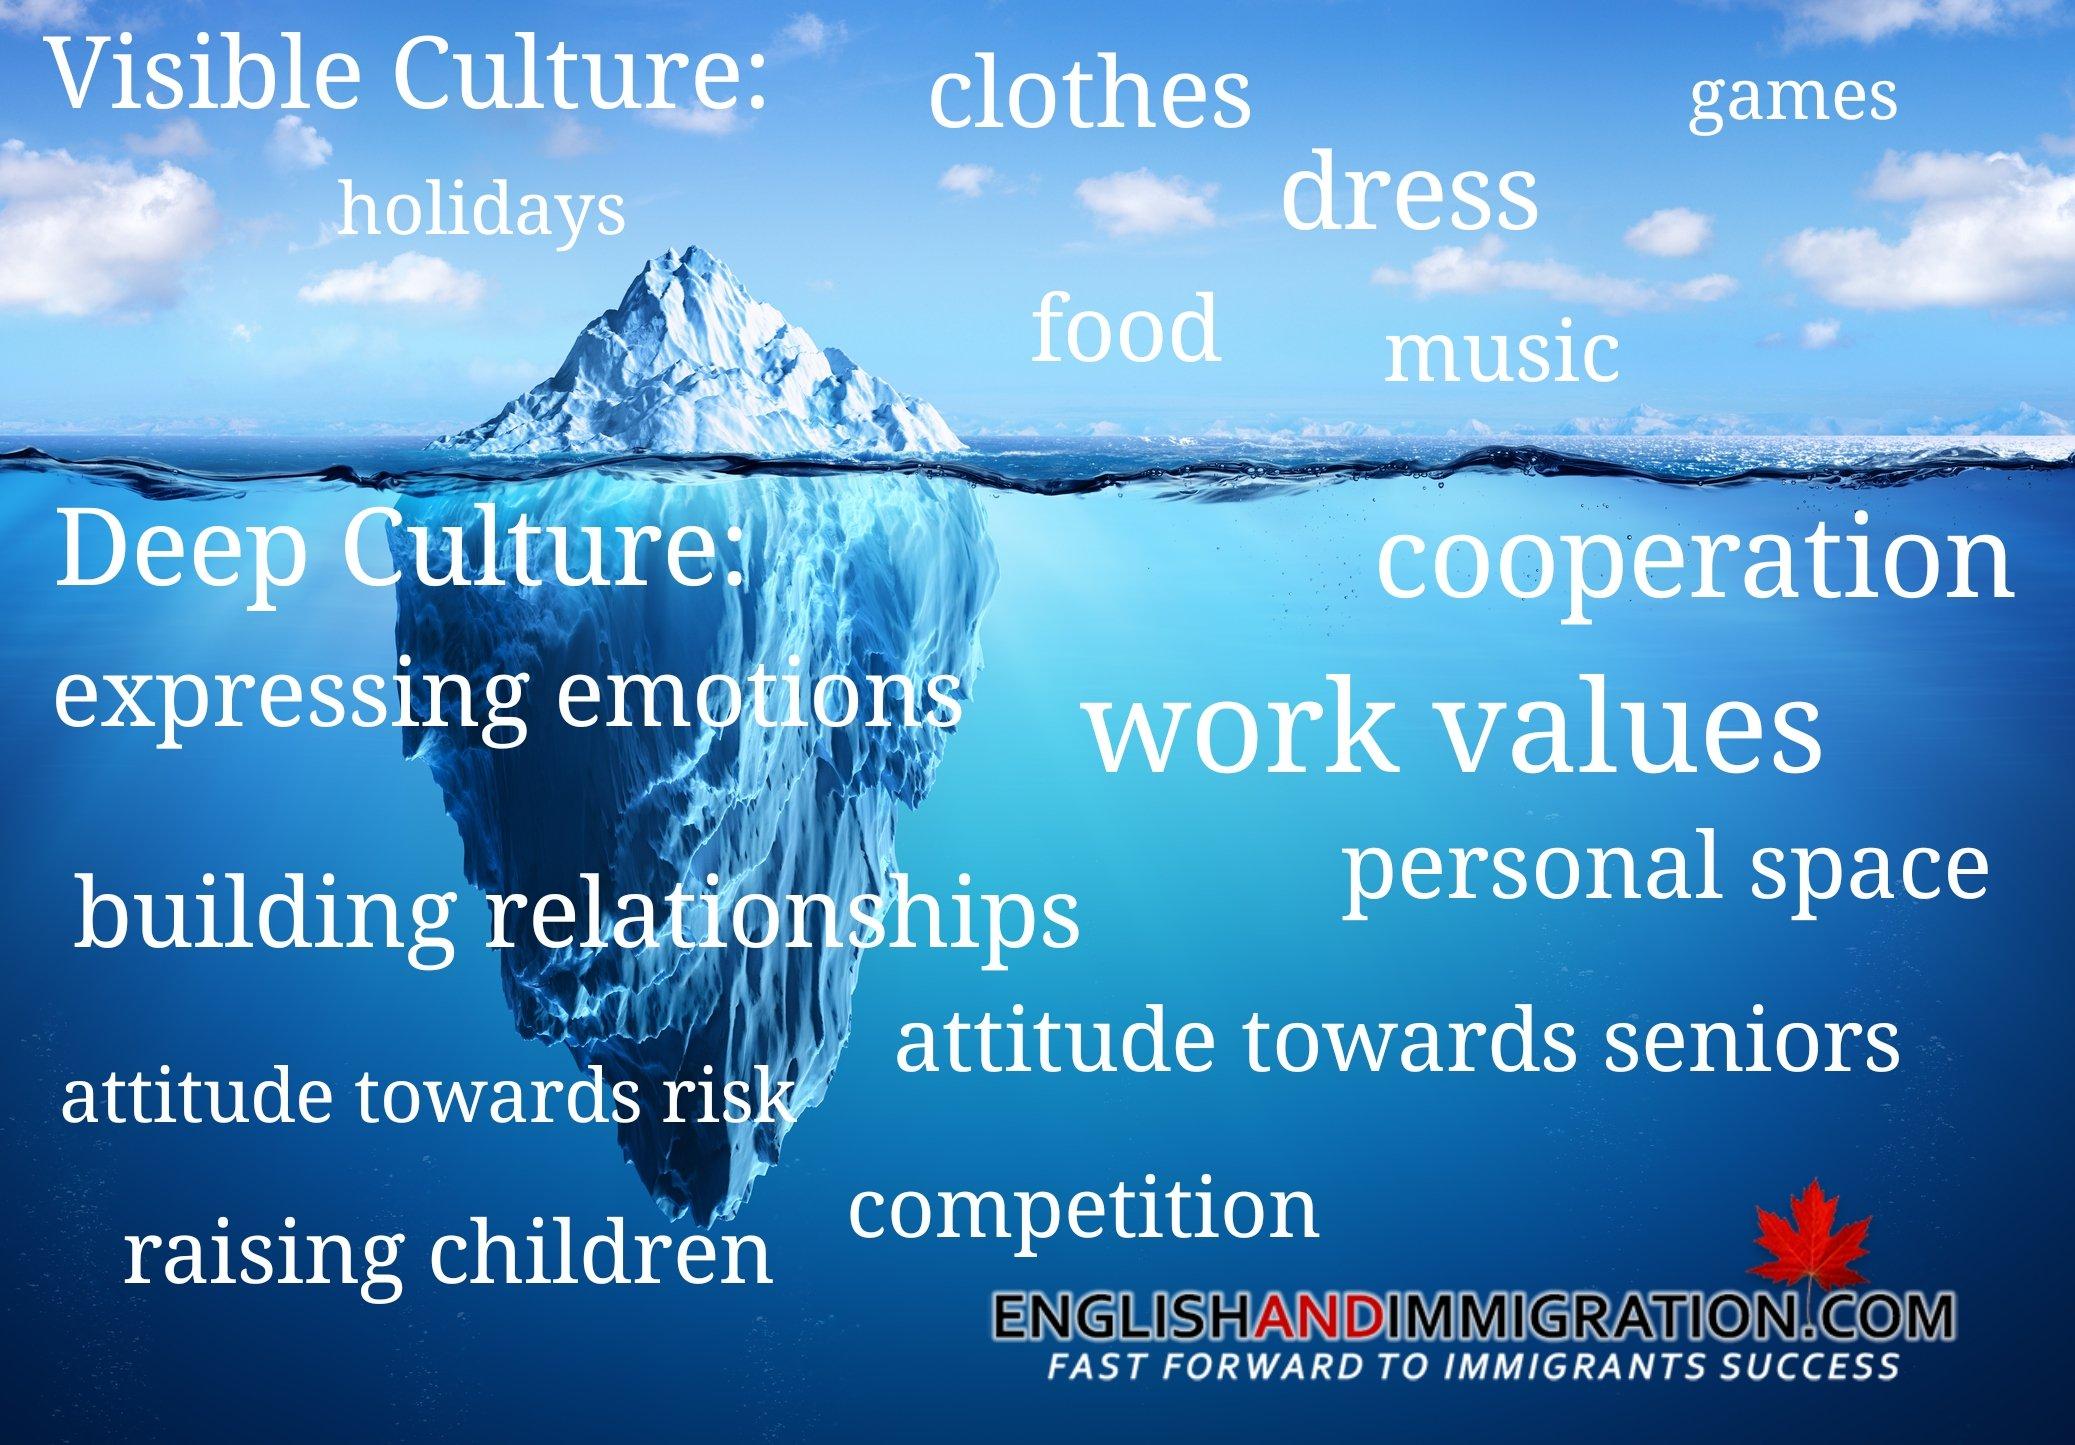 culture iceberg english immigration